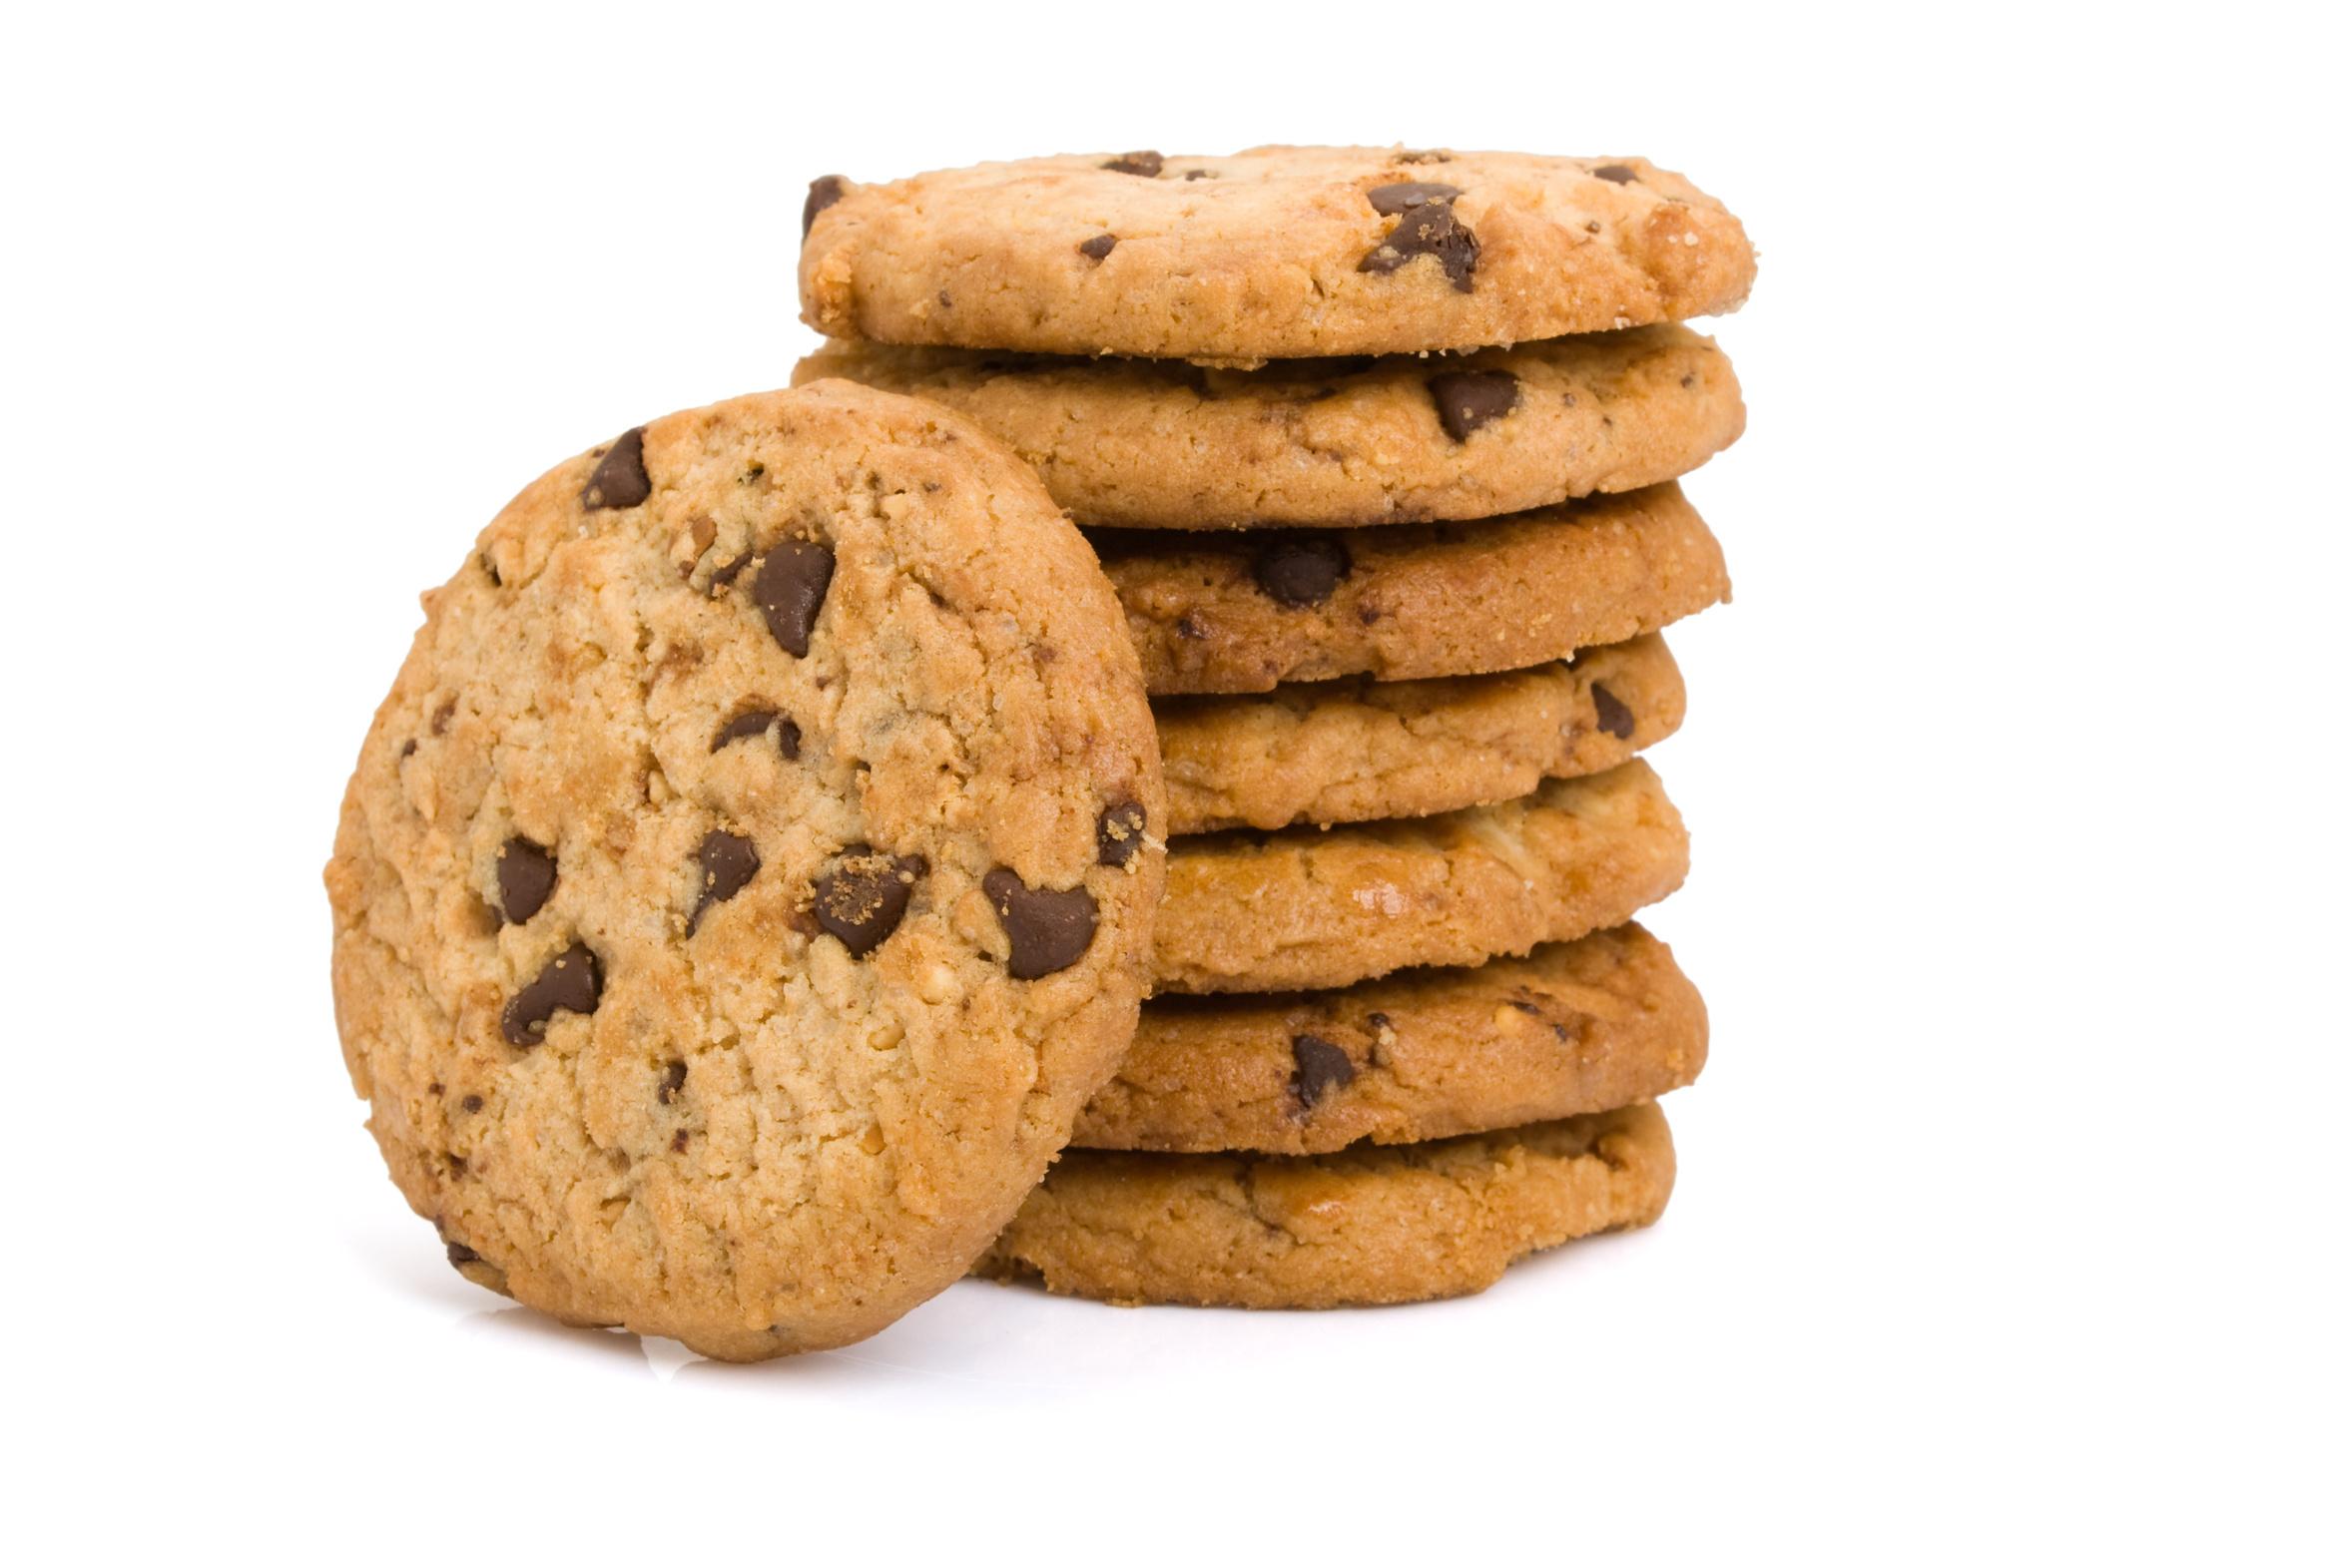 Cookies Hd Wallpaper